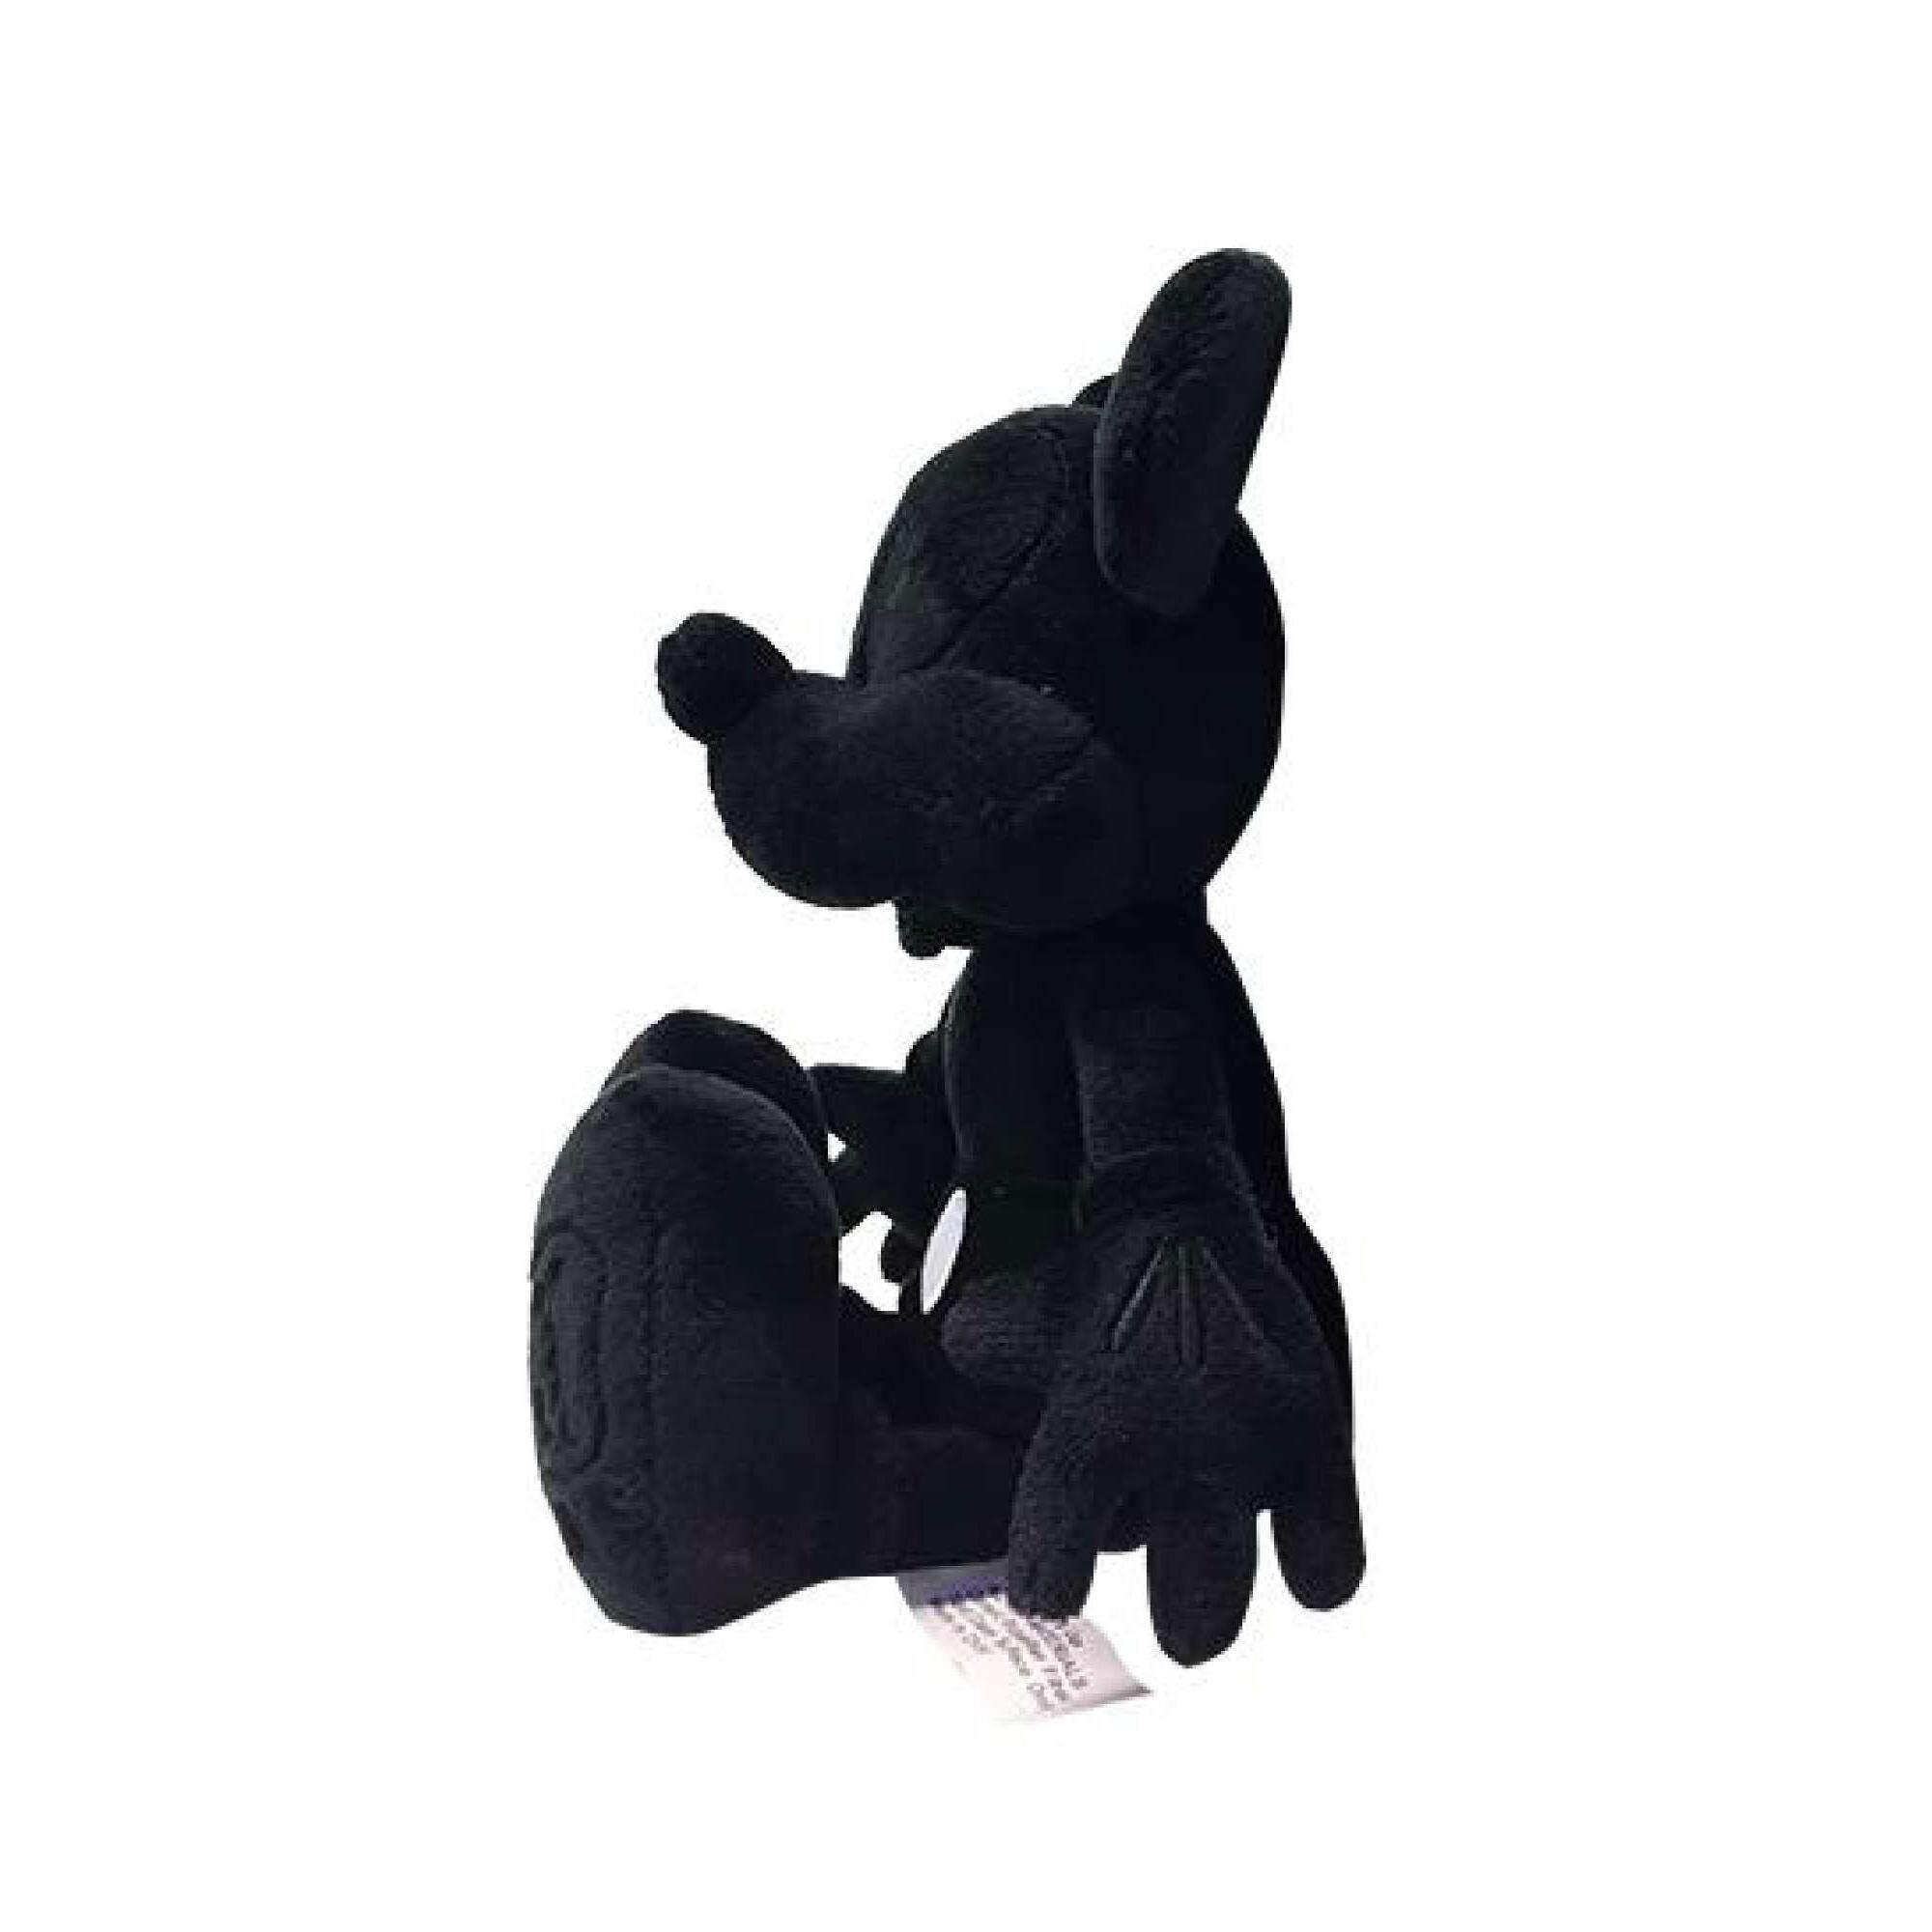 Disney Mickey 90th Anniversary 10 Mickey Plush Toy - Black